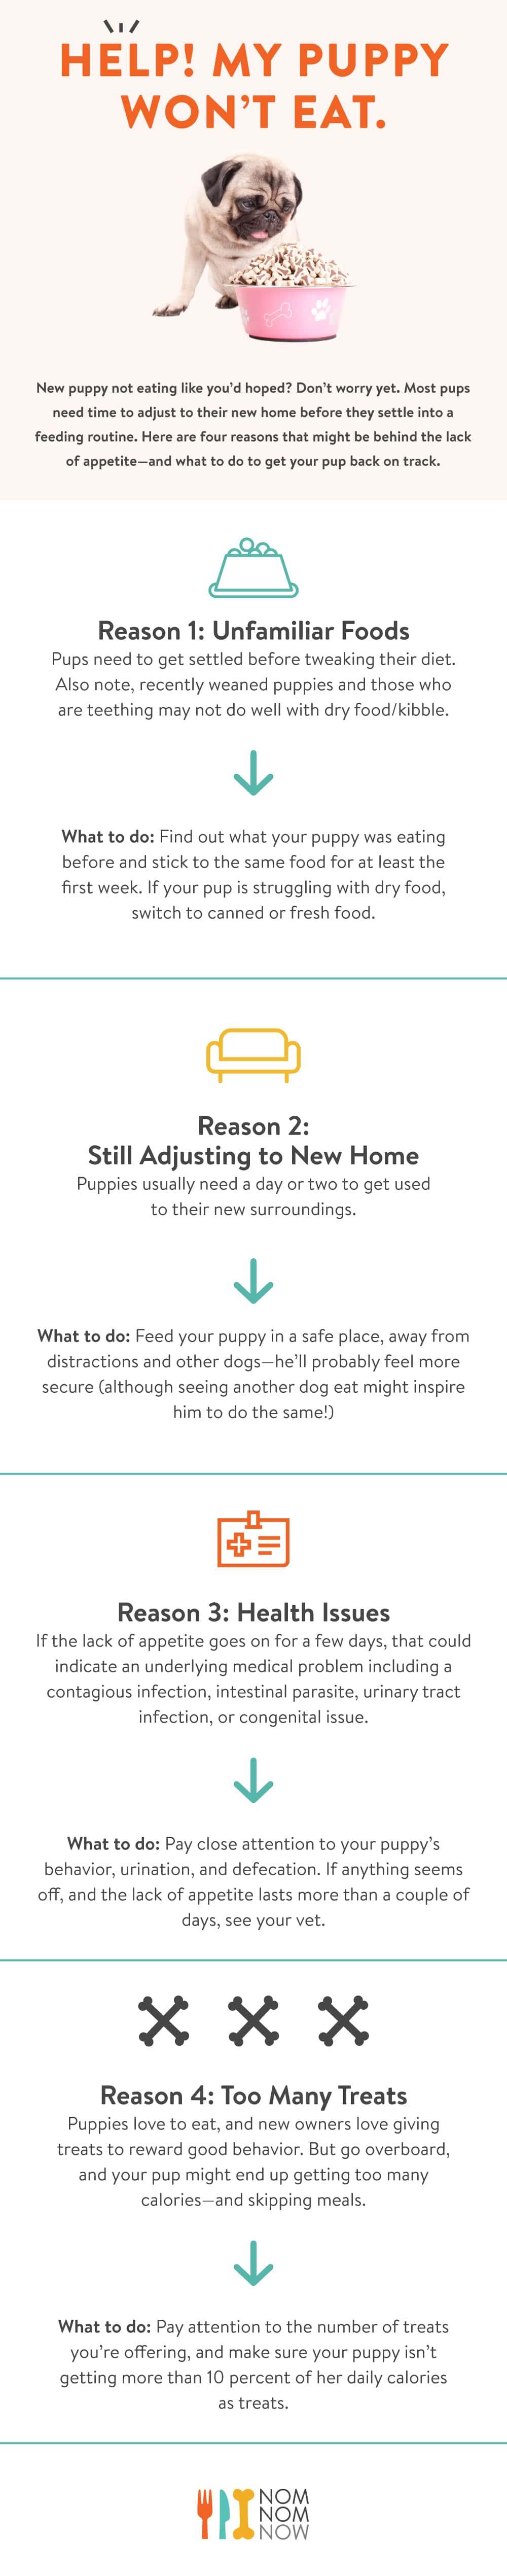 puppy_not_eating_reasons.jpg